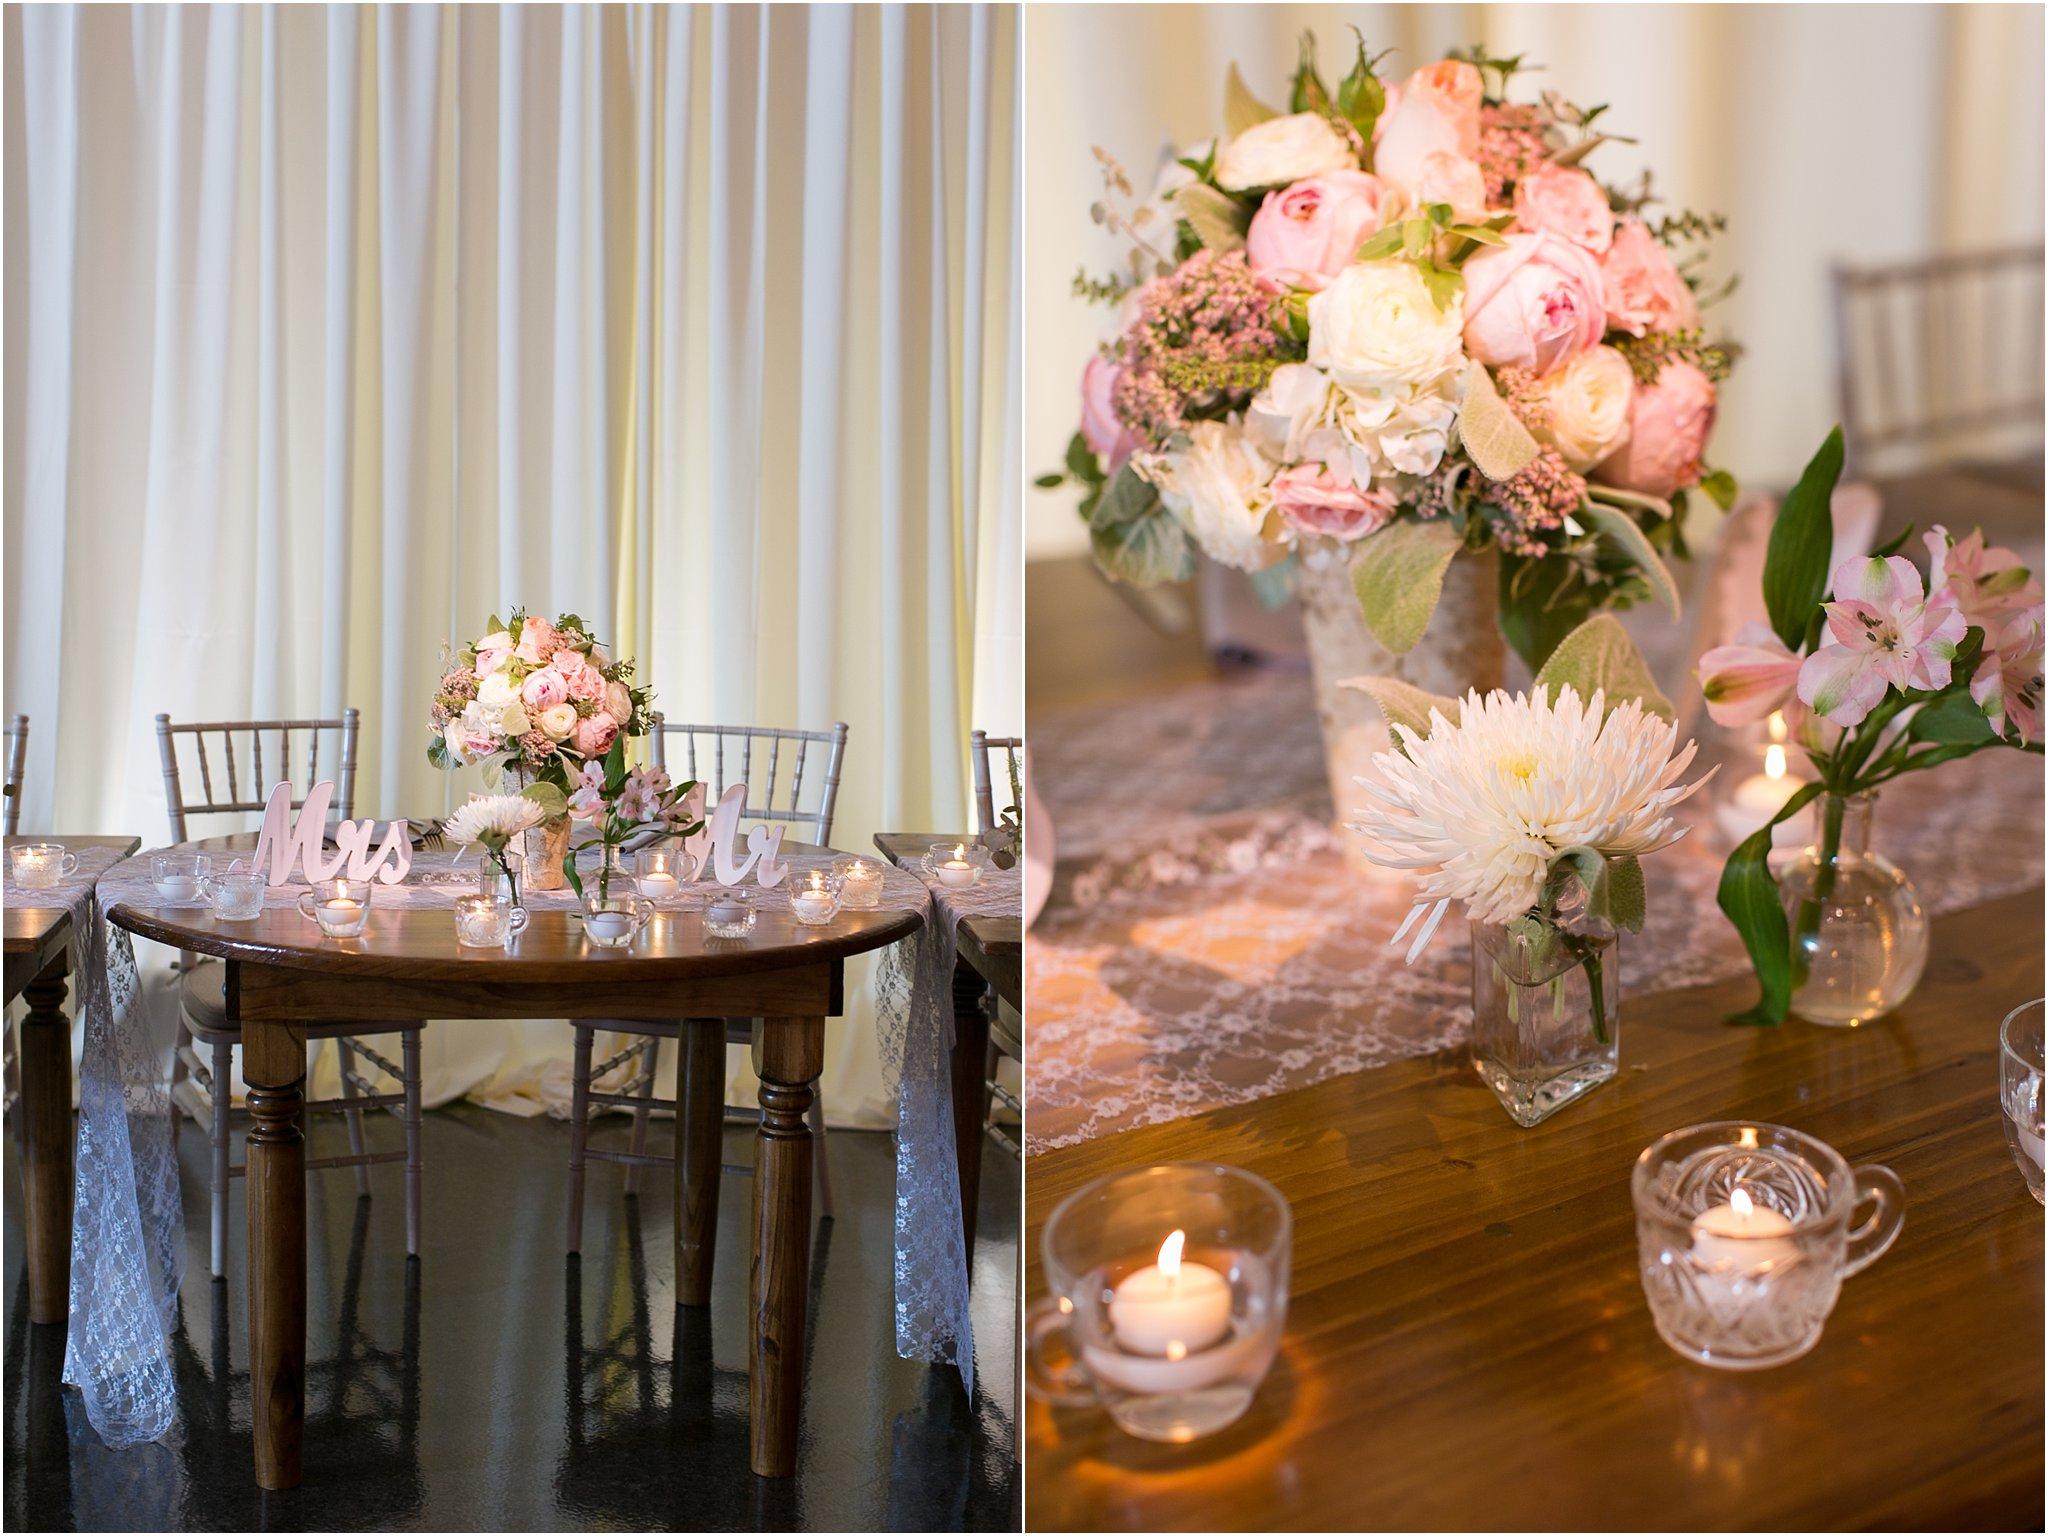 jessica_ryan_photography_virginia_wedding_photographer_wedding_hurricane_norfolk_botanical_gardens_hurricane_matthew_wedding_3621